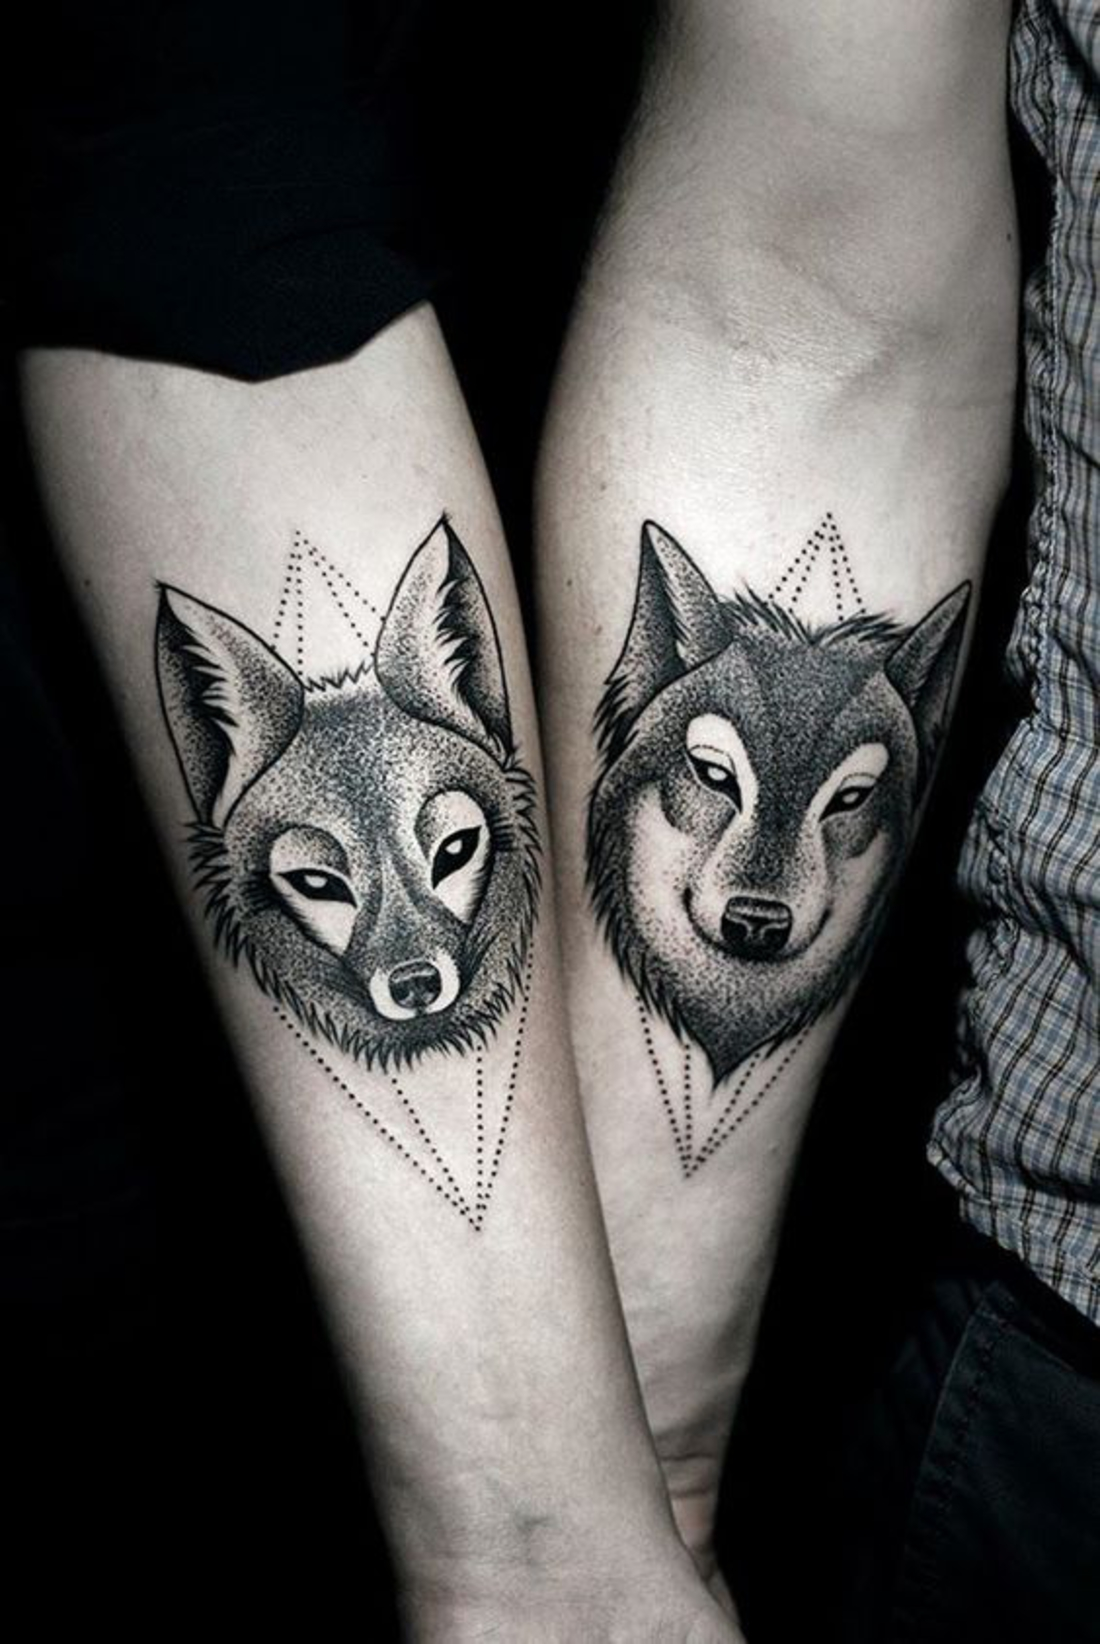 tatuajes en pareja, muy interesante, lobos femenino y masculino, tatuaje diferente